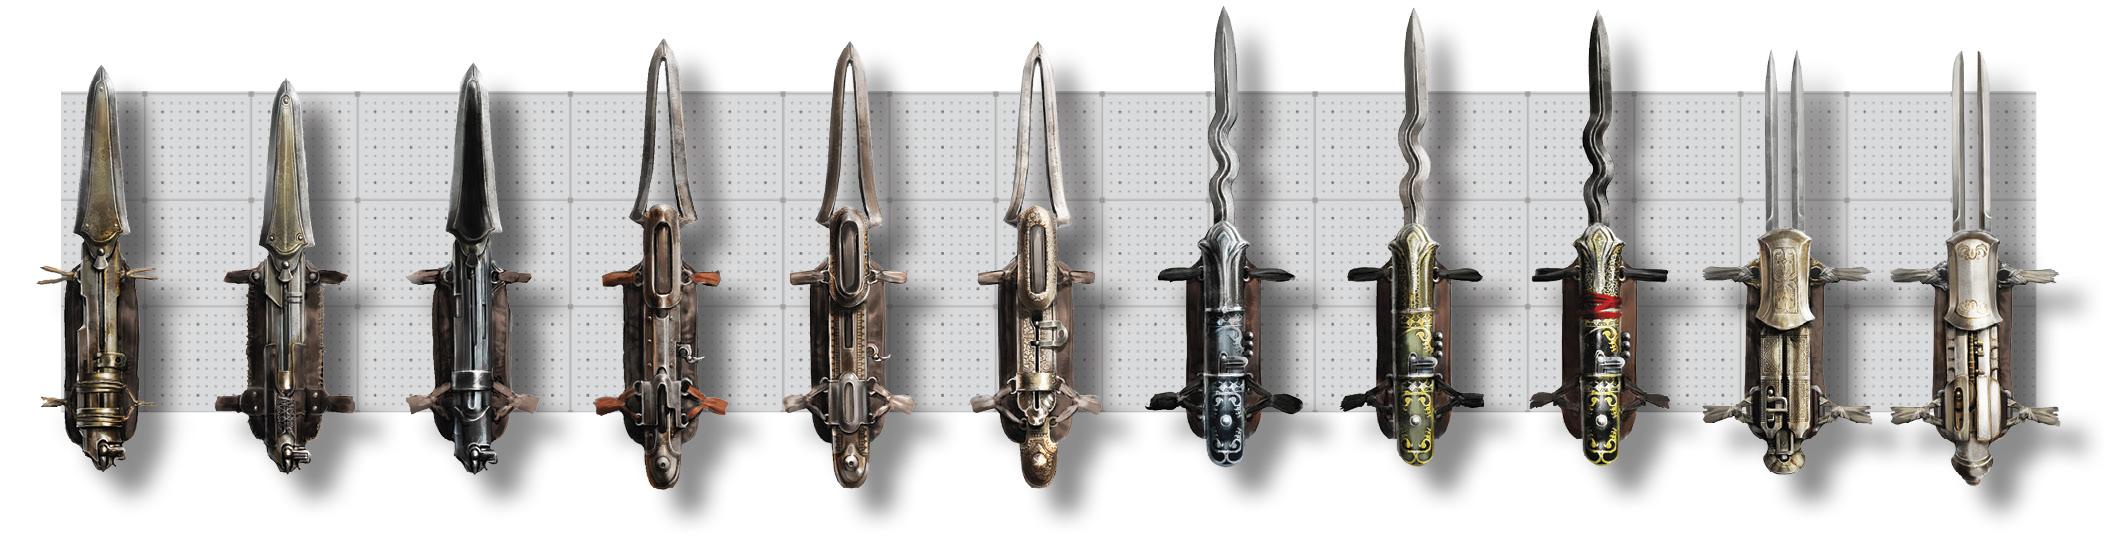 Crafting Assassin S Creed Origins Assassin S Creed Wiki Fandom